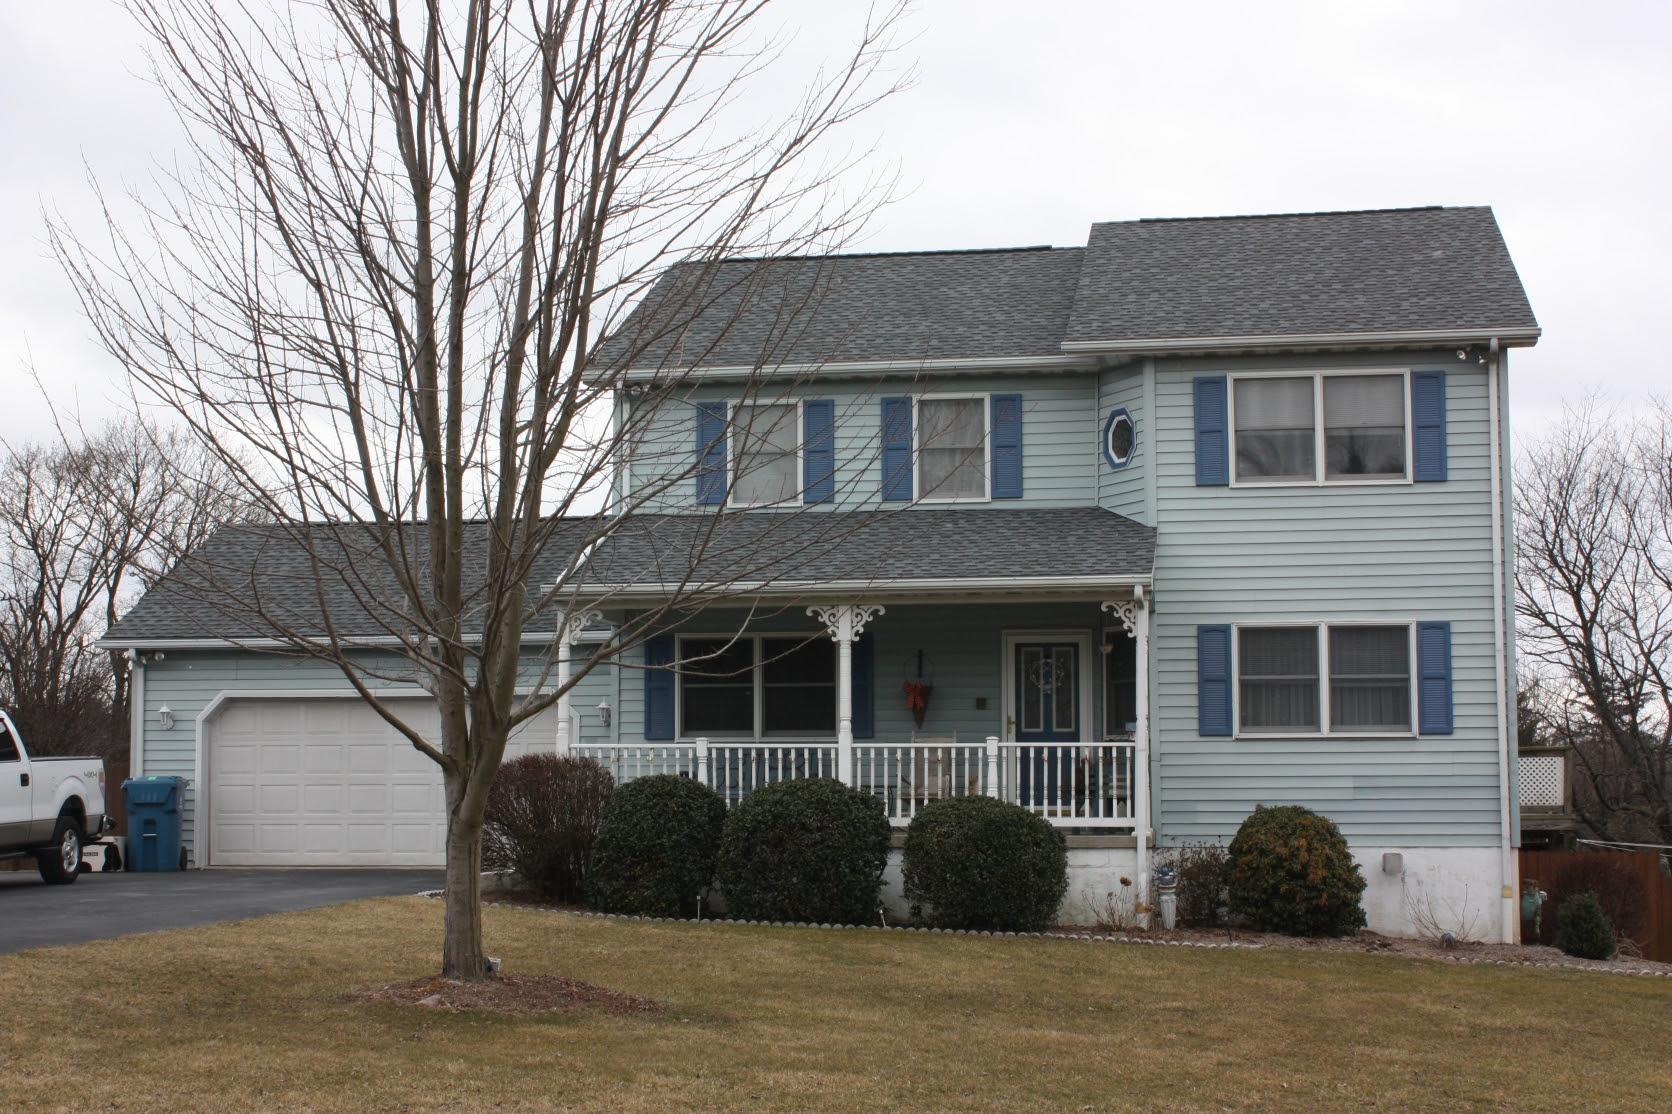 Bosse Home Improvements Bhi Hanover Pa 17331 New Oxford Mcsherrystown Easy Berlin York County Adams County